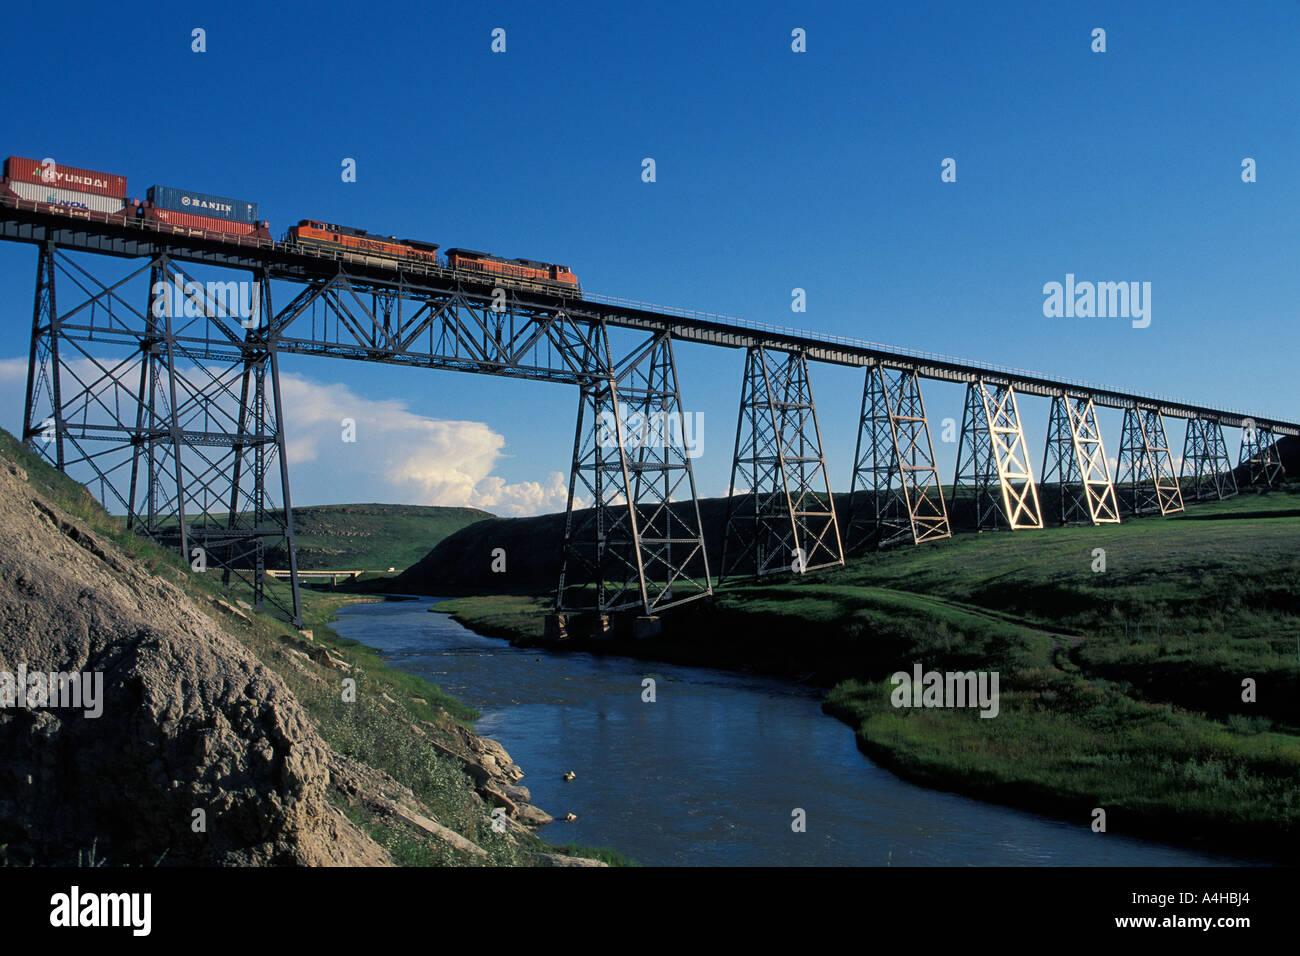 Freight train crossing railroad trestle over Cutbank Creek Cutbank